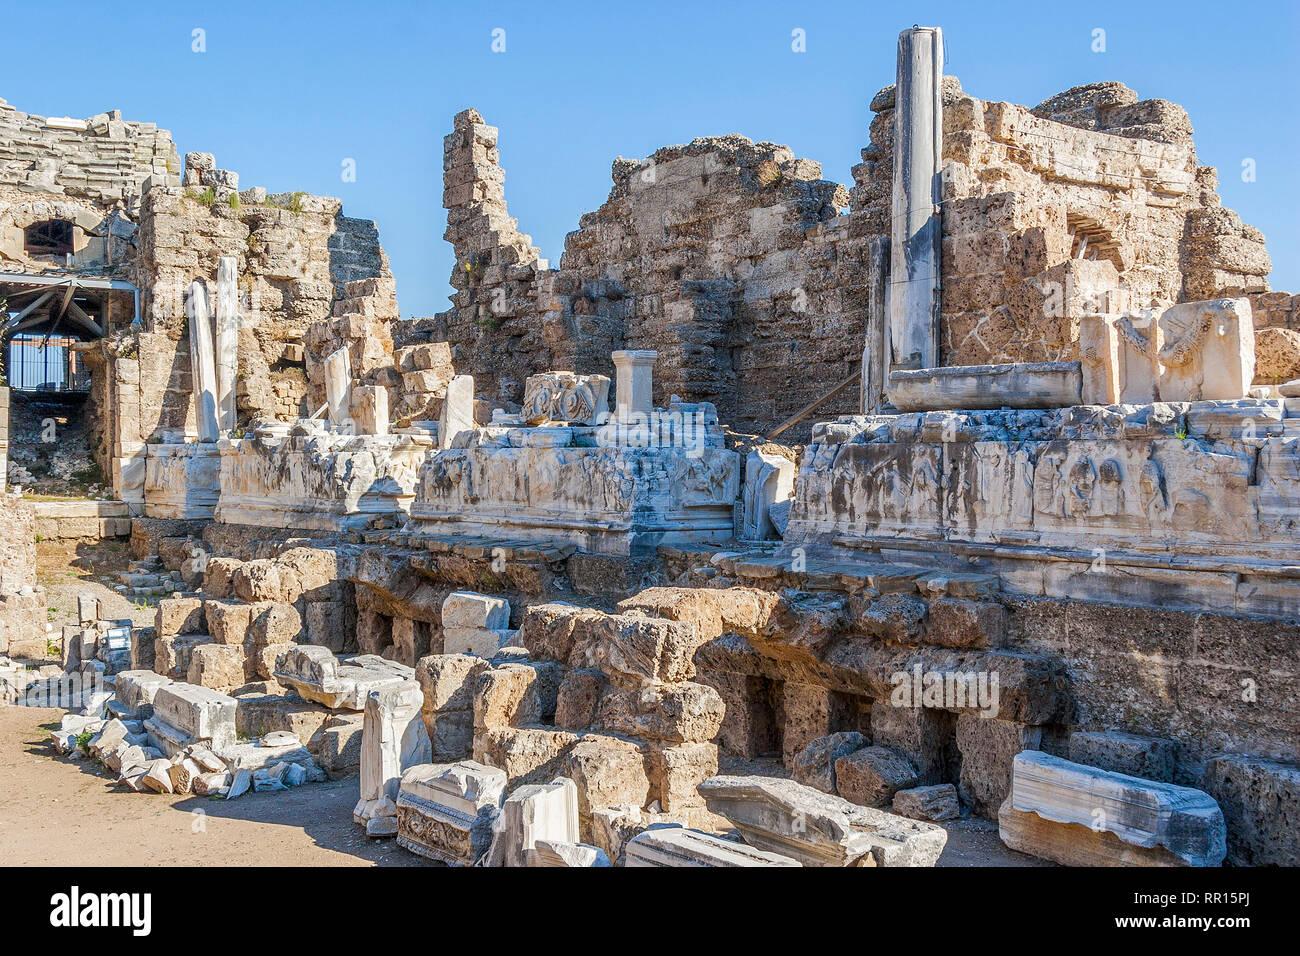 Amphitheatre, Side, Turkey Stock Photo